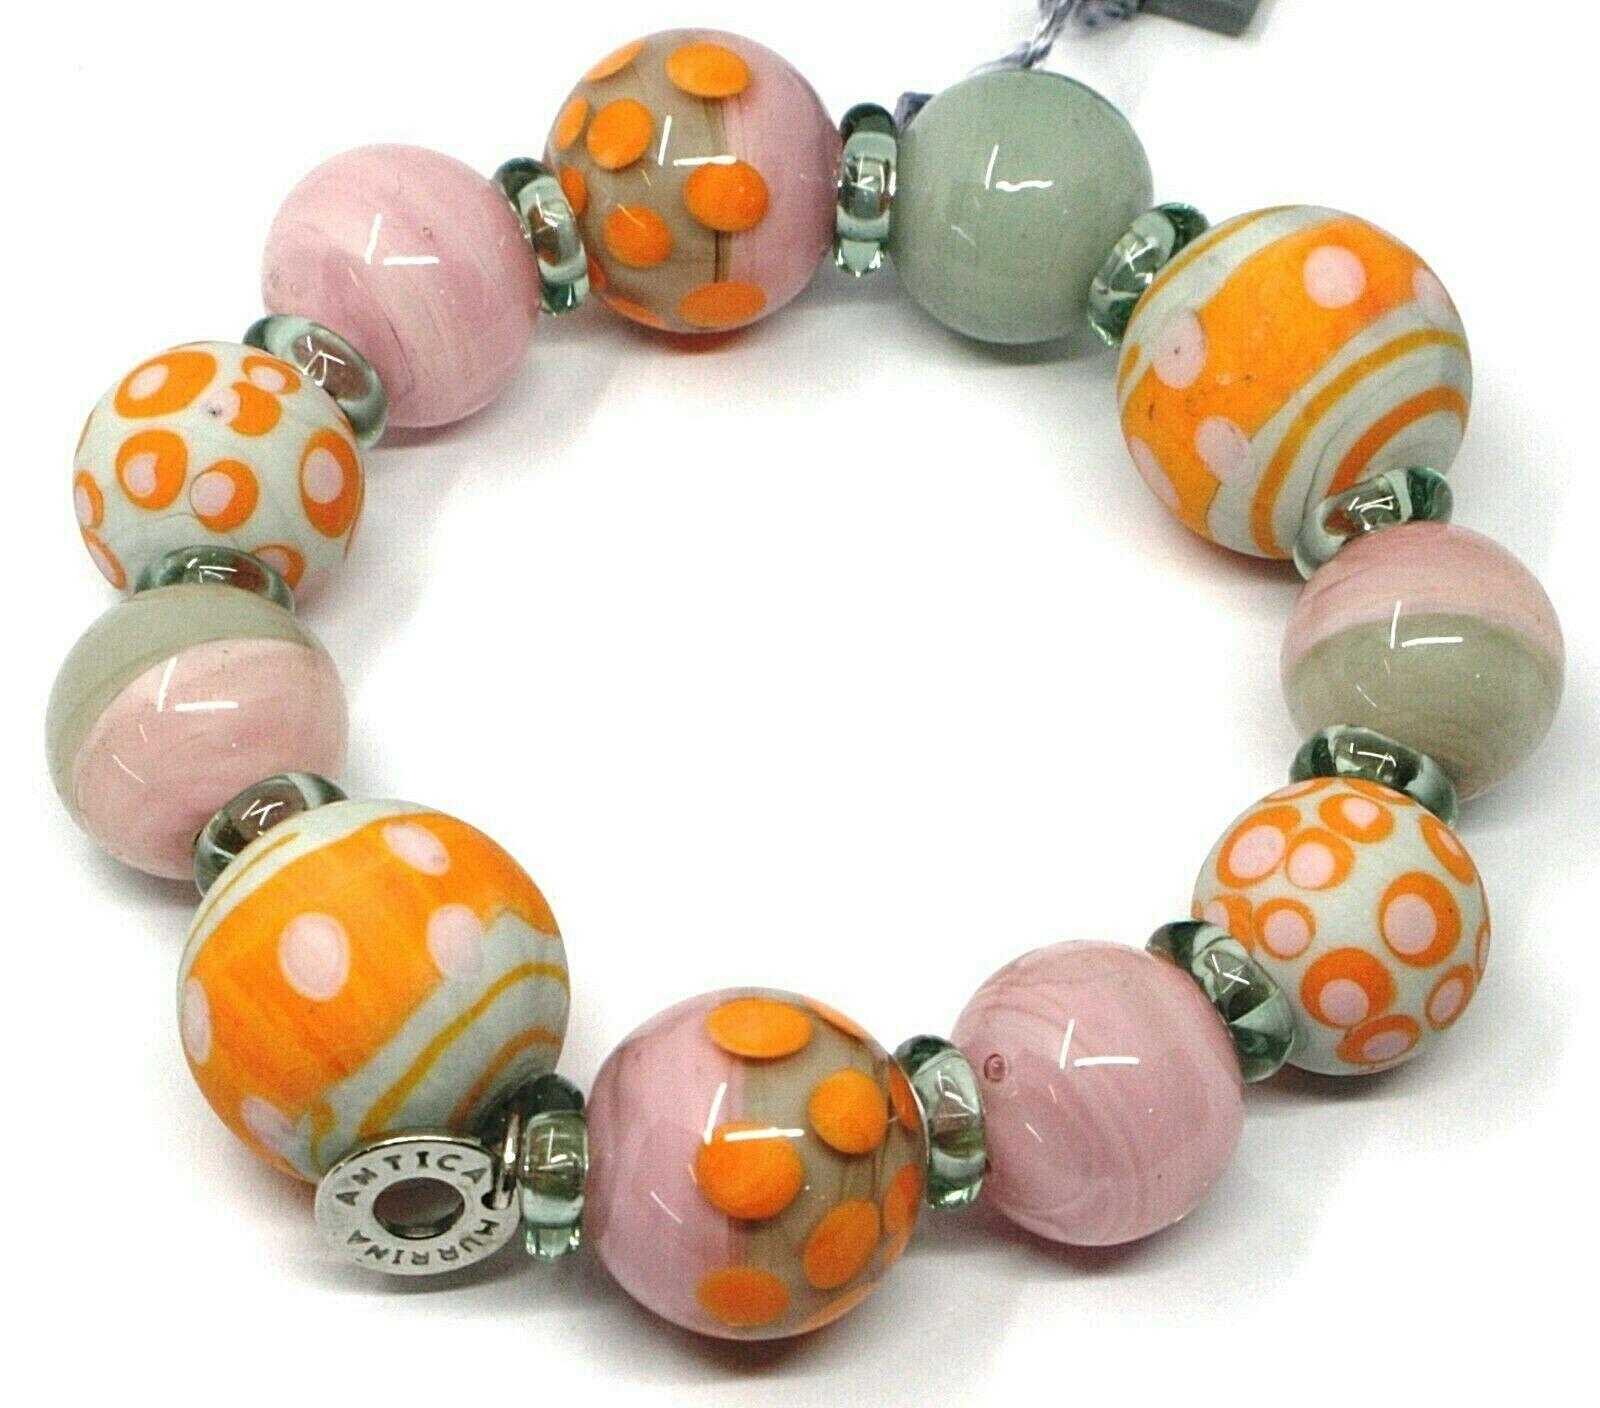 Bracelet Antica Murrina Venezia, BR717A25 Pink Orange, Ball Polka dot, Speckled